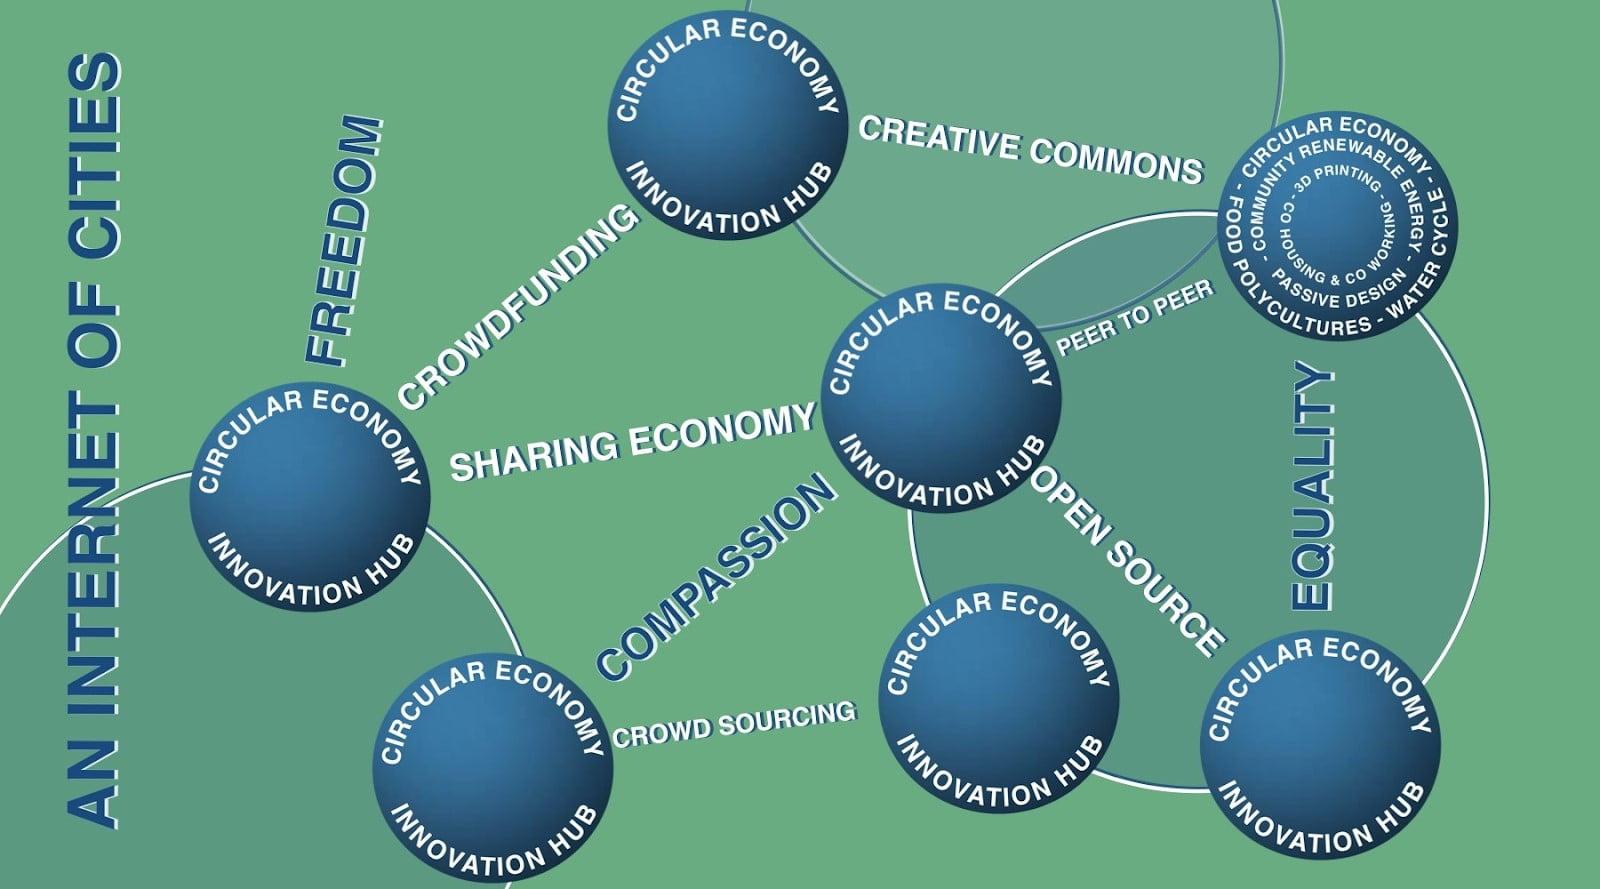 The Circular Economy Innovation Hubs model